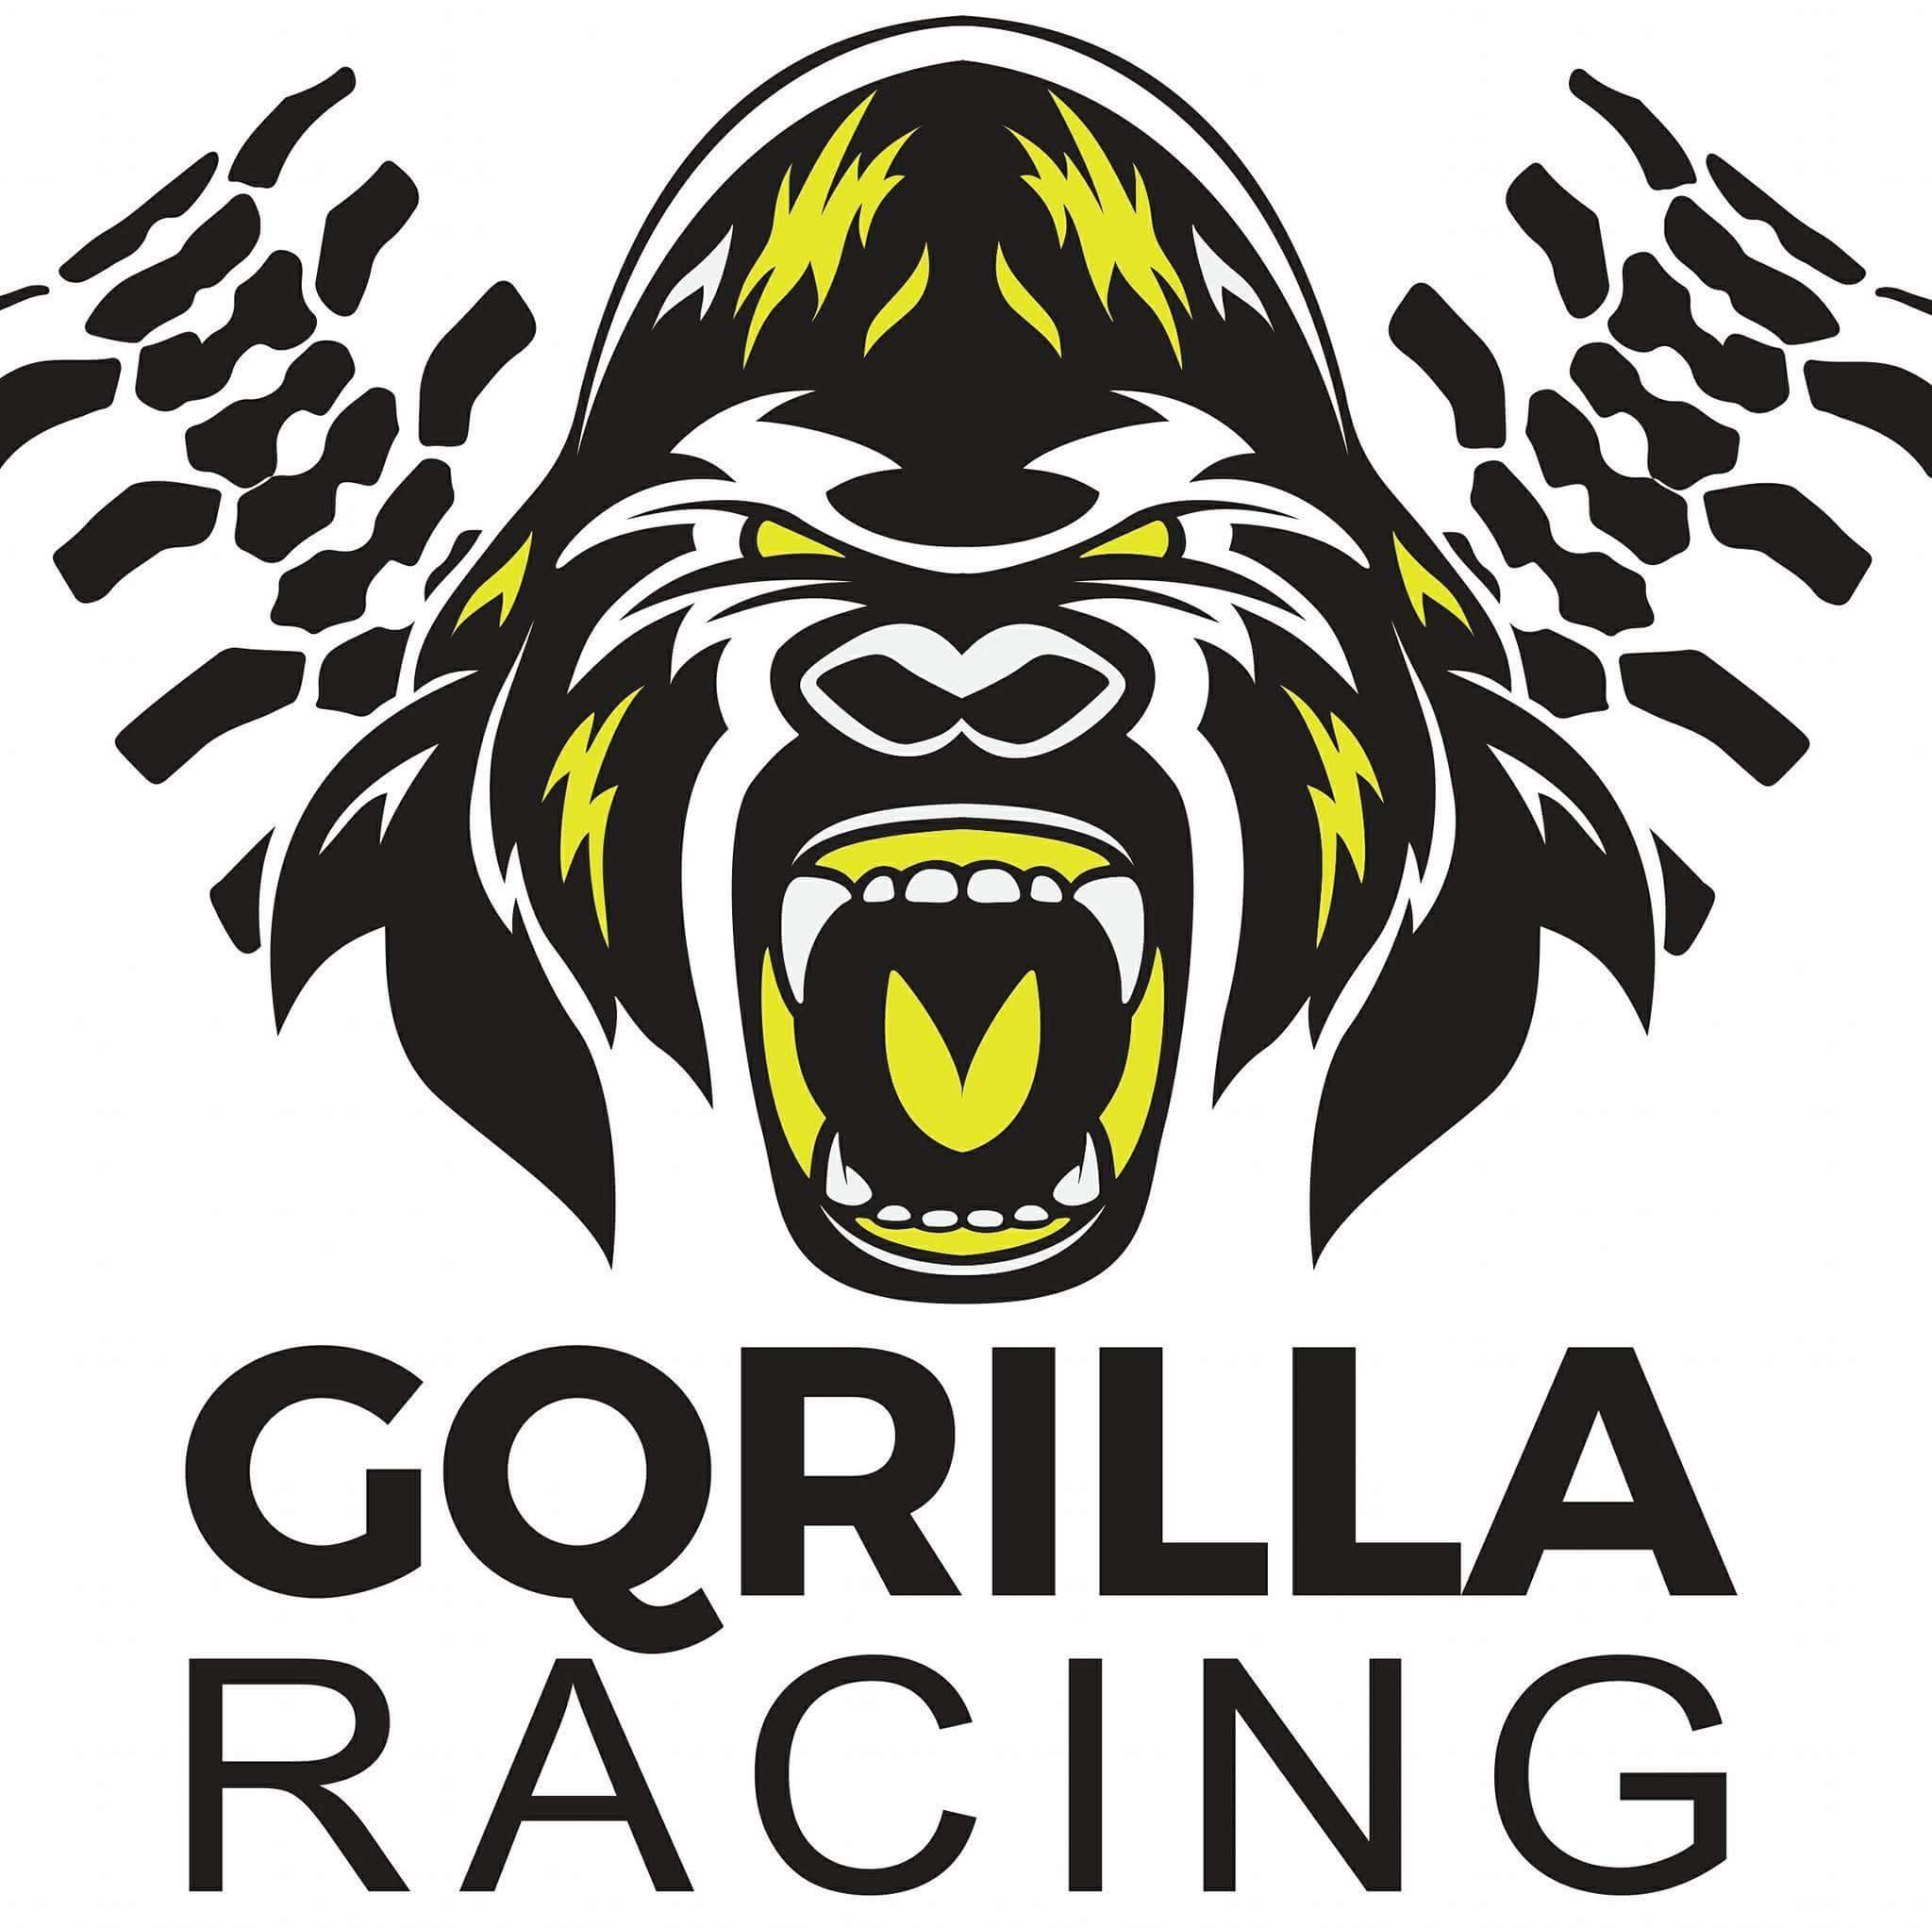 GORILLA RACING